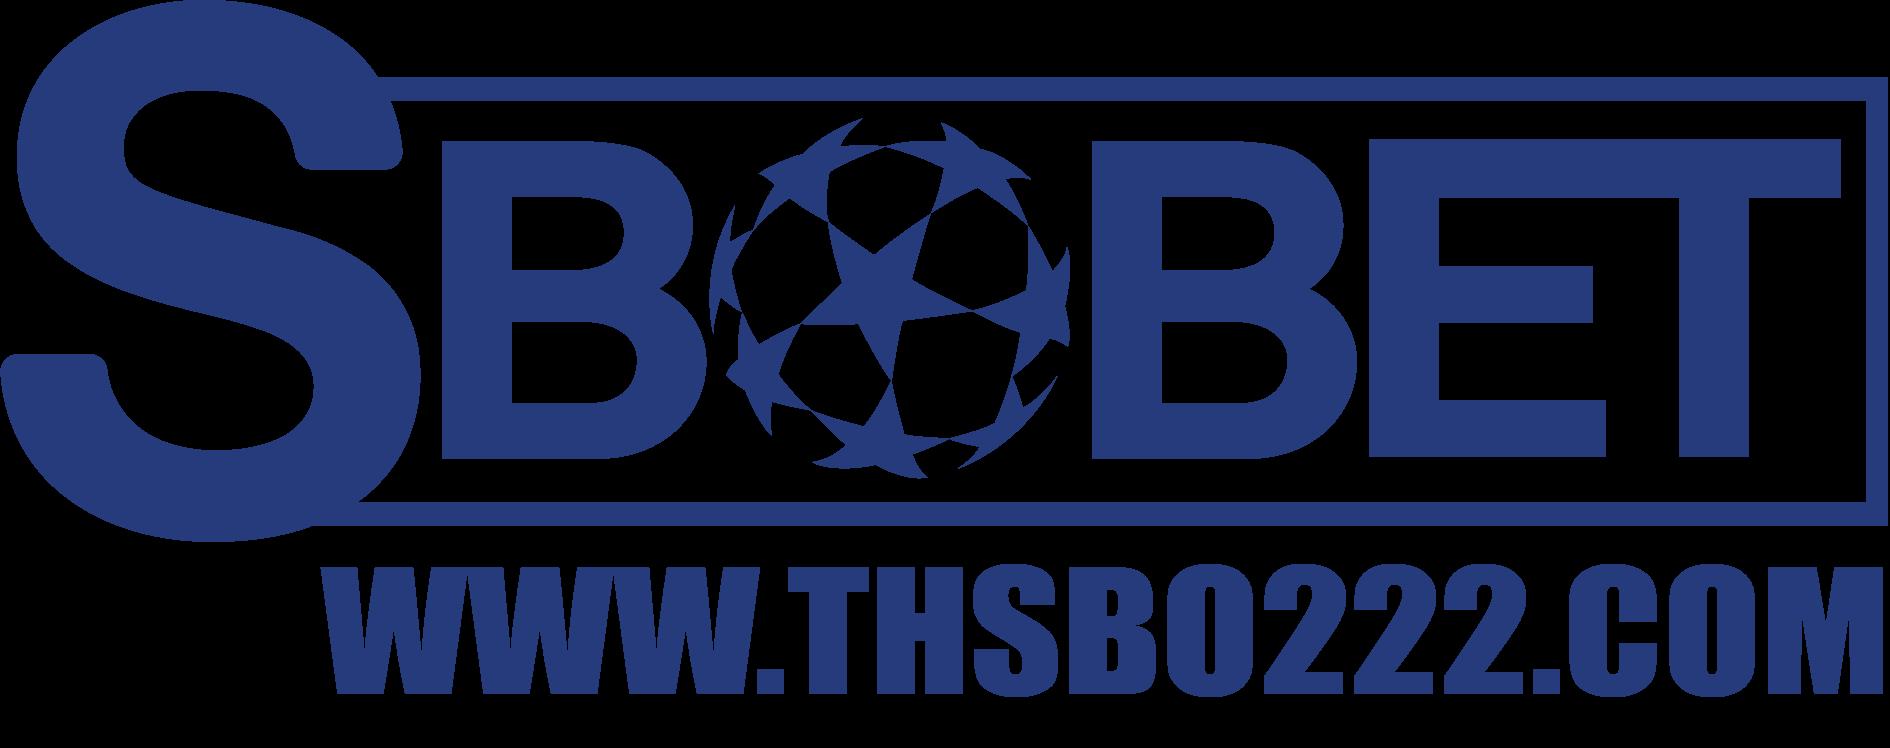 Sbothai เว็บแทงบอลผ่านเน็ตโดย Sbobet Asia